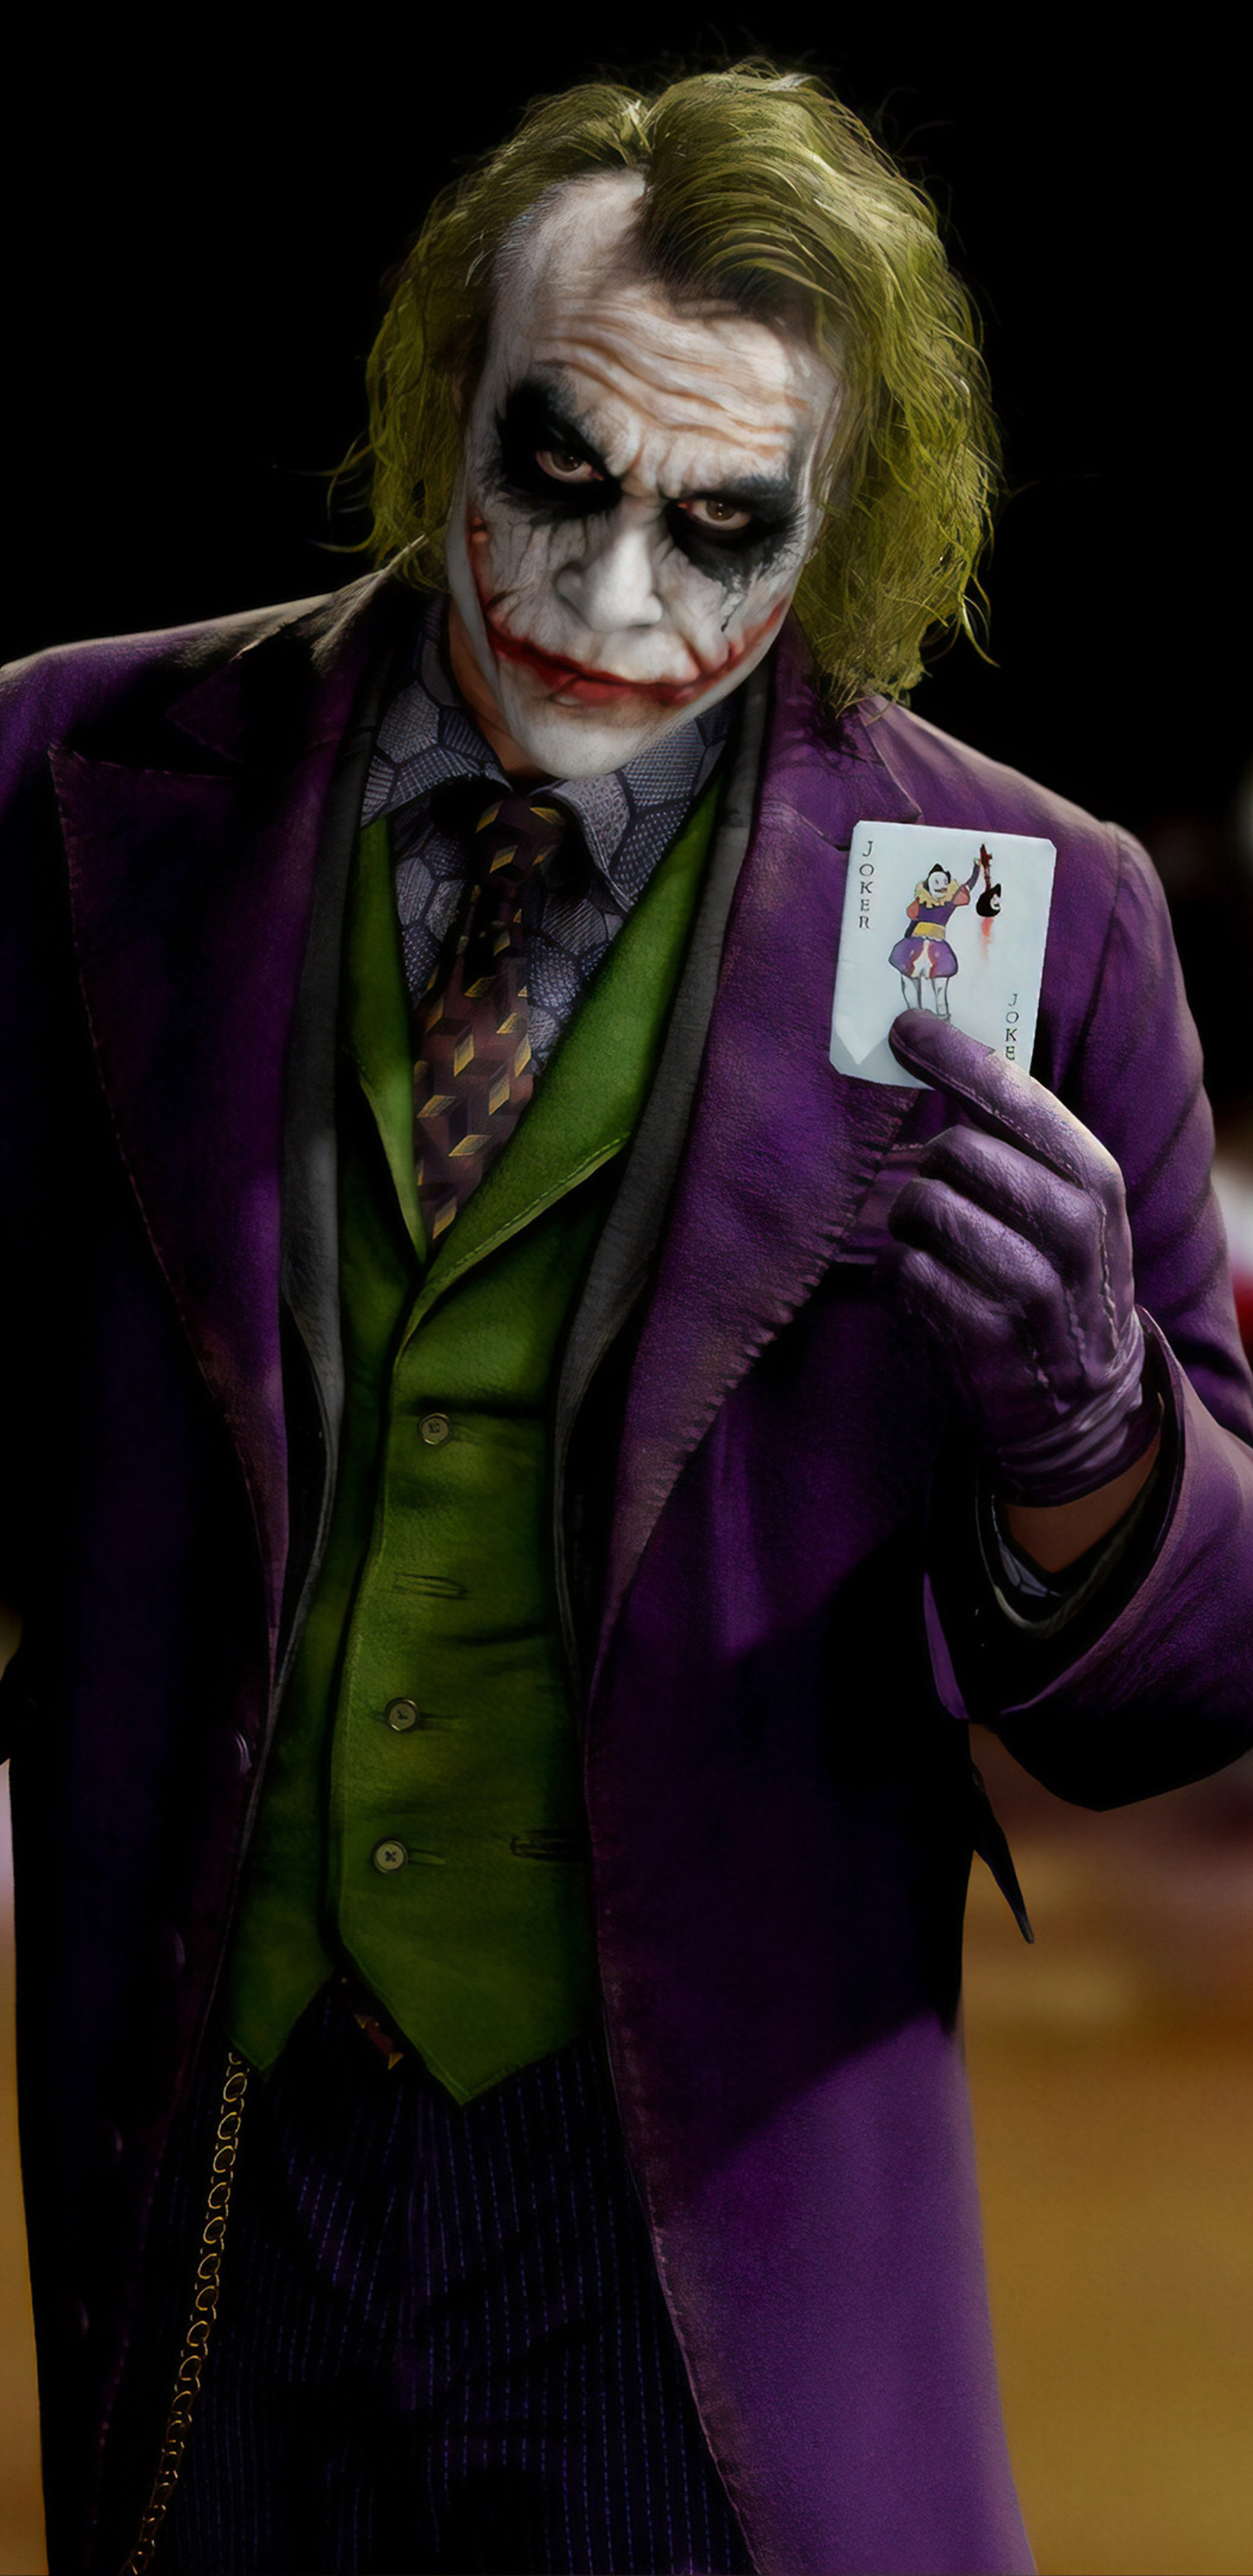 1440x2960 Joker Heath Ledger Flip It 4k Samsung Galaxy ...